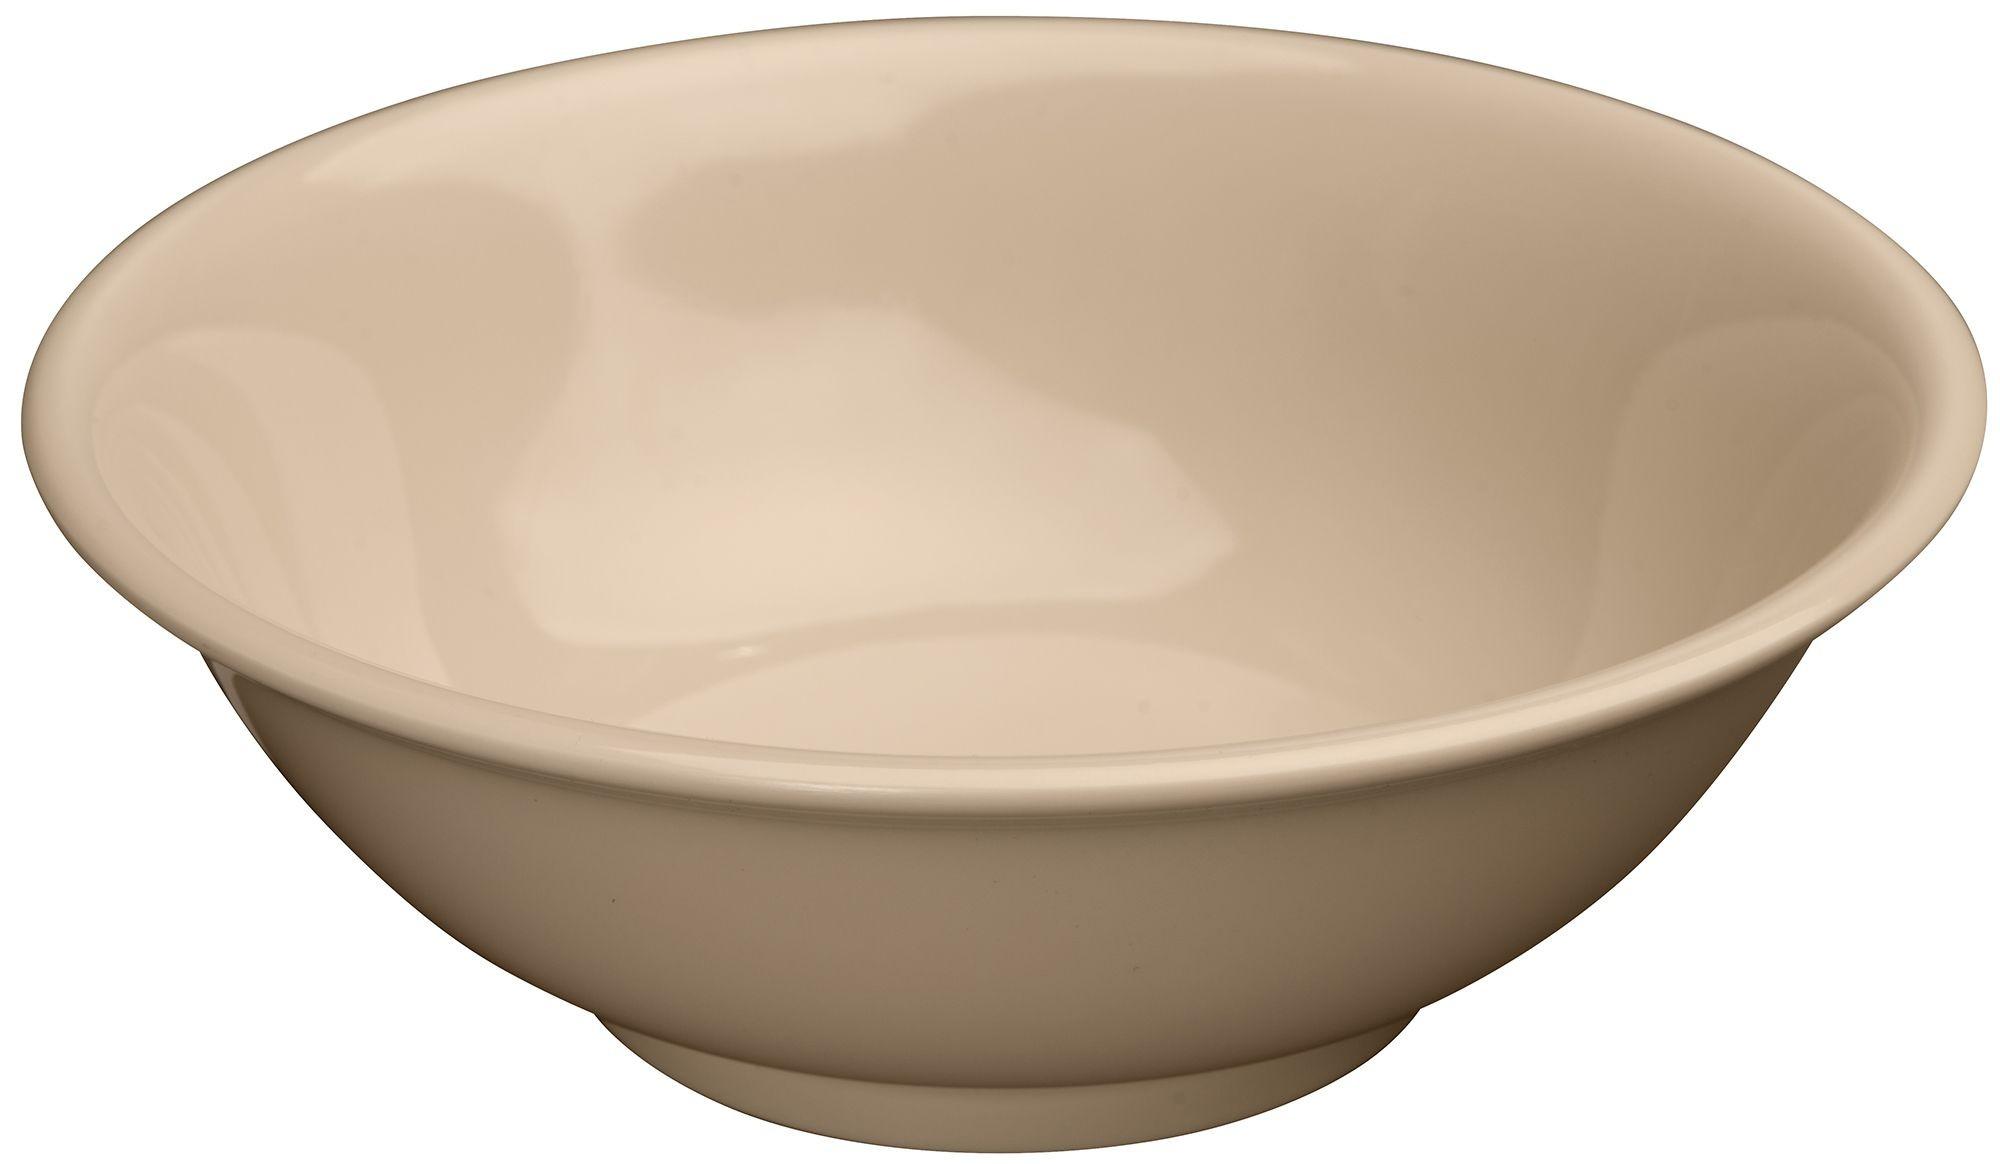 Winco MMB-70 Tan Melamine Rimless Bowl 70 oz.